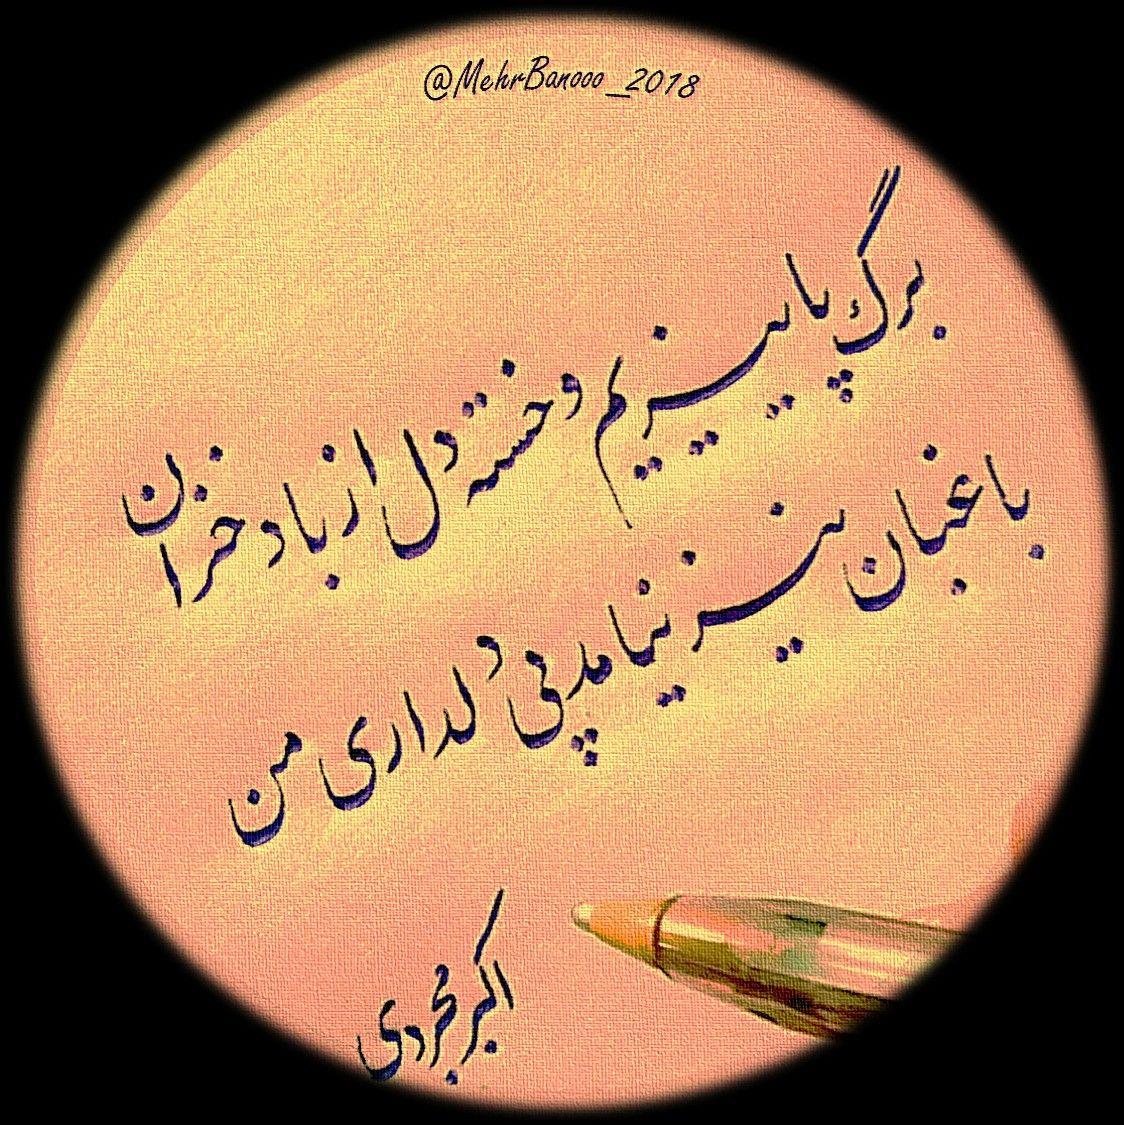 عکس نوشته عکس پروفایل کانال تلگرام مهر بانو ۲۰۱۸ Mehrbanooo 2018 Persian Poem Poems Calligraphy